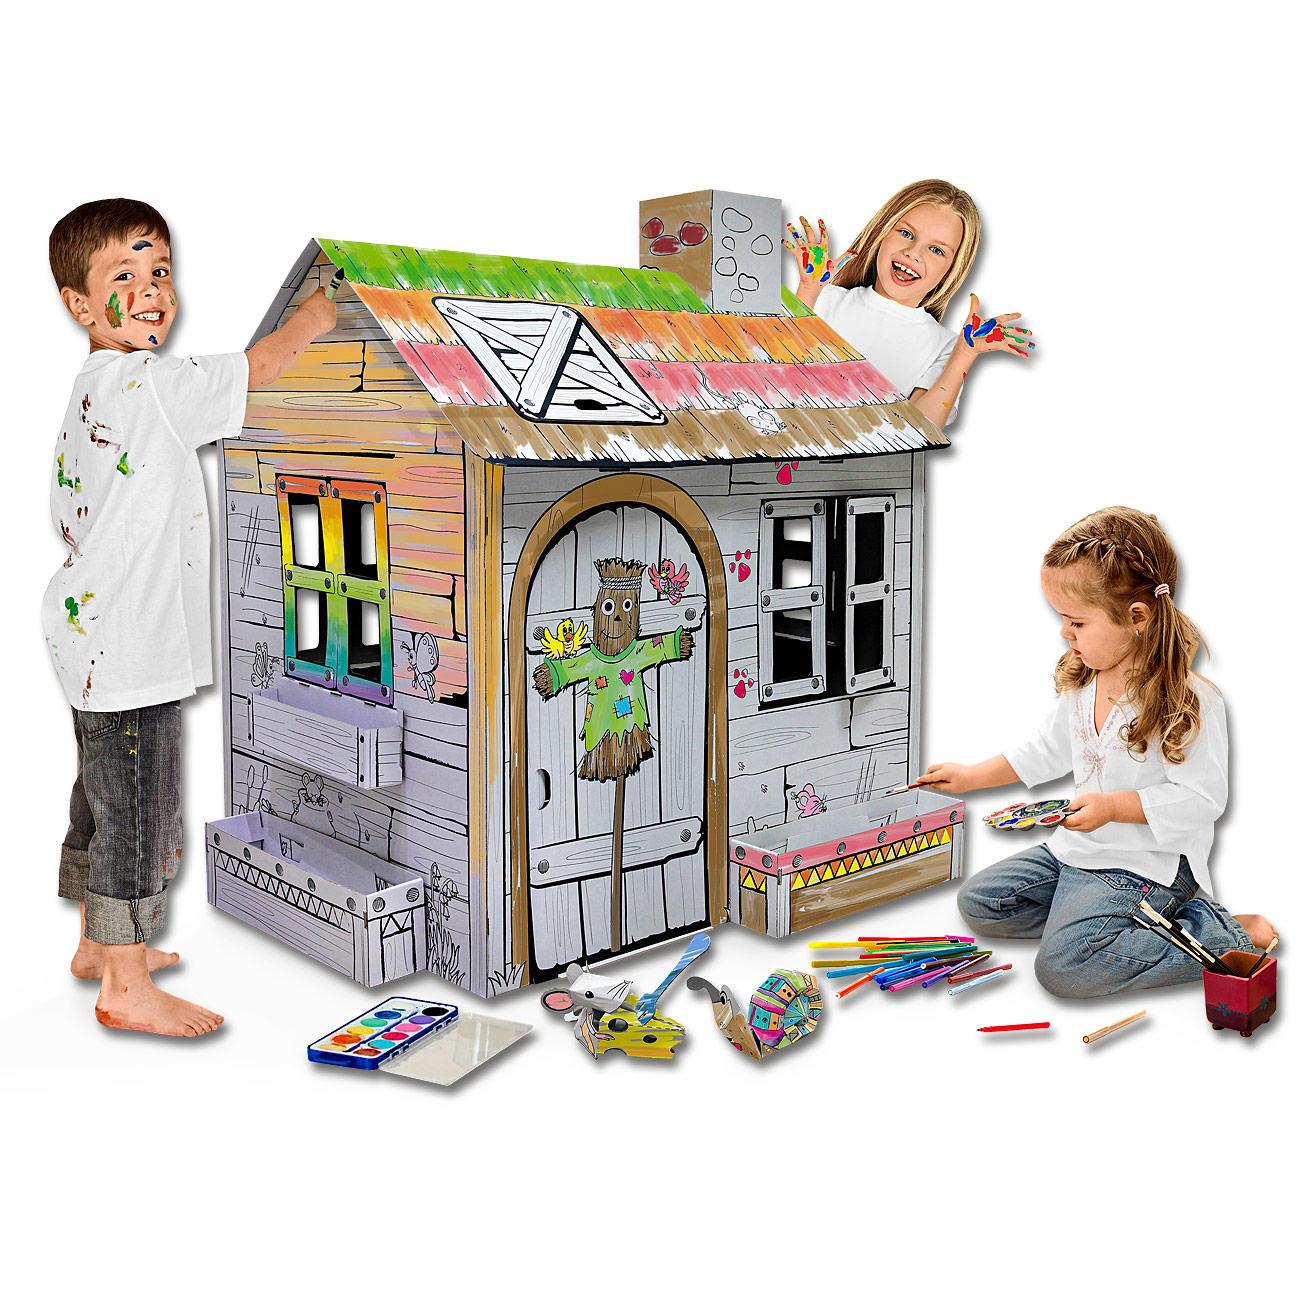 xxl spielhaus gartenh uschen. Black Bedroom Furniture Sets. Home Design Ideas